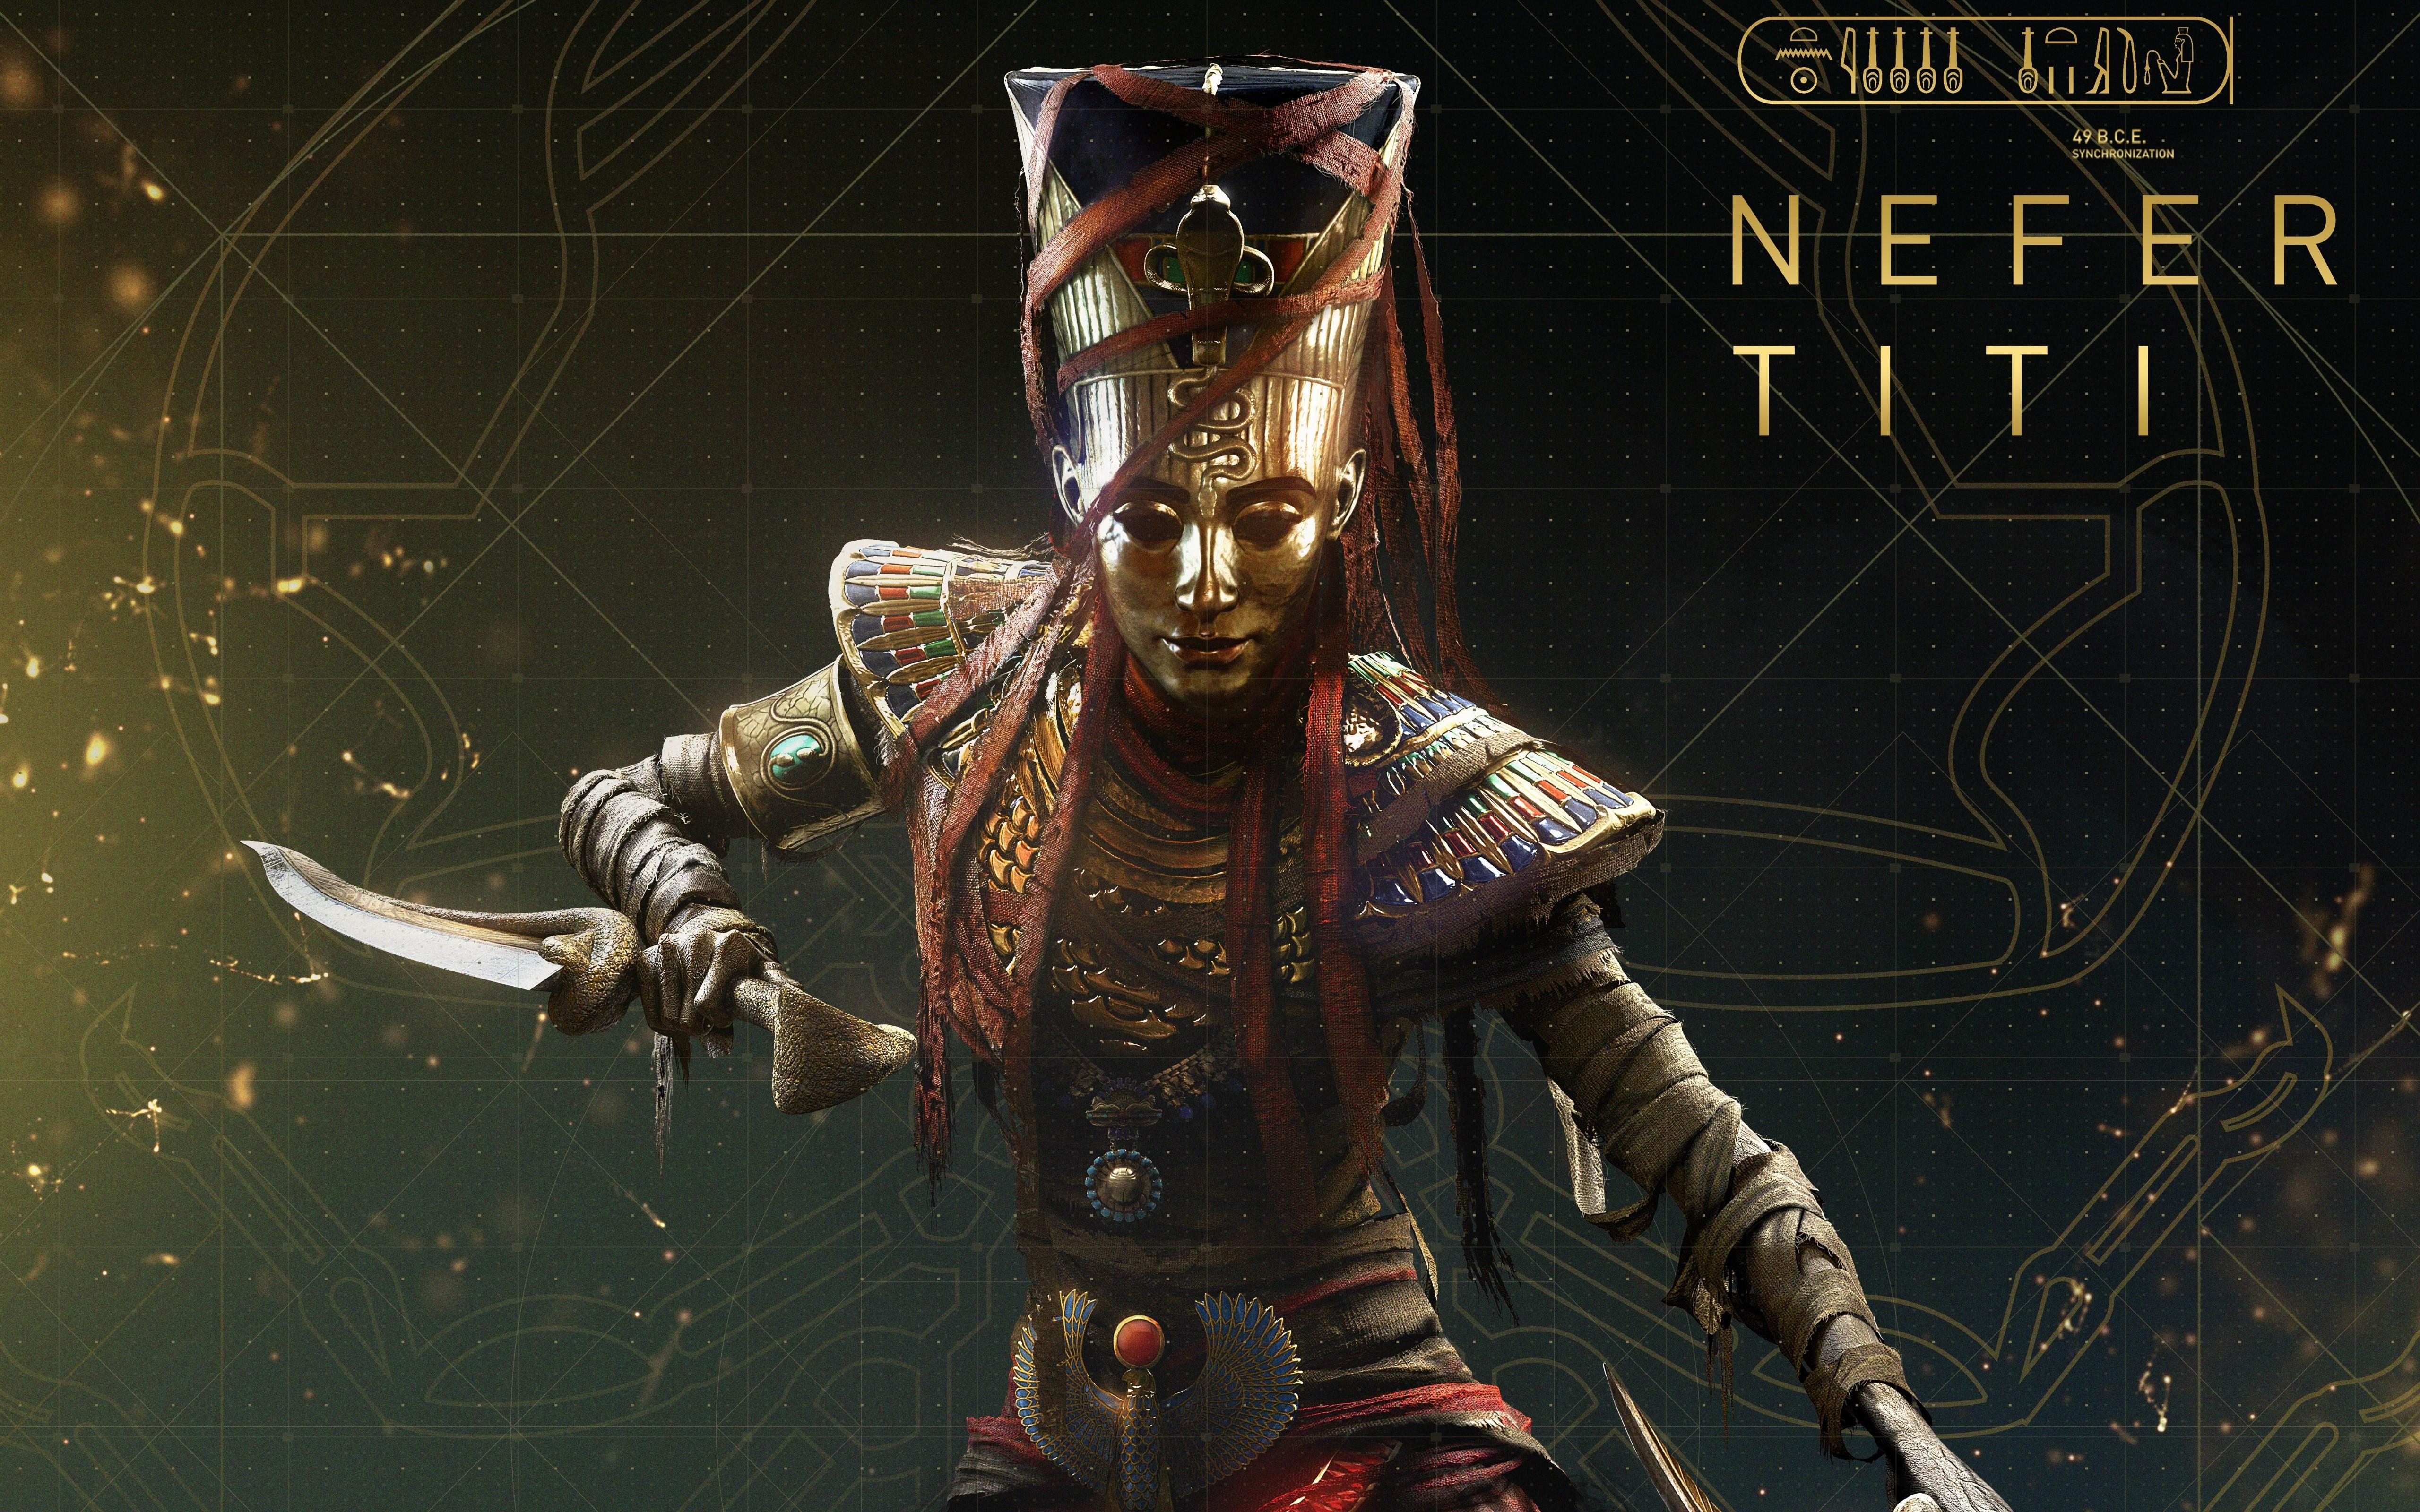 Download Wallpaper: Nefertiti From Assassin's Creed